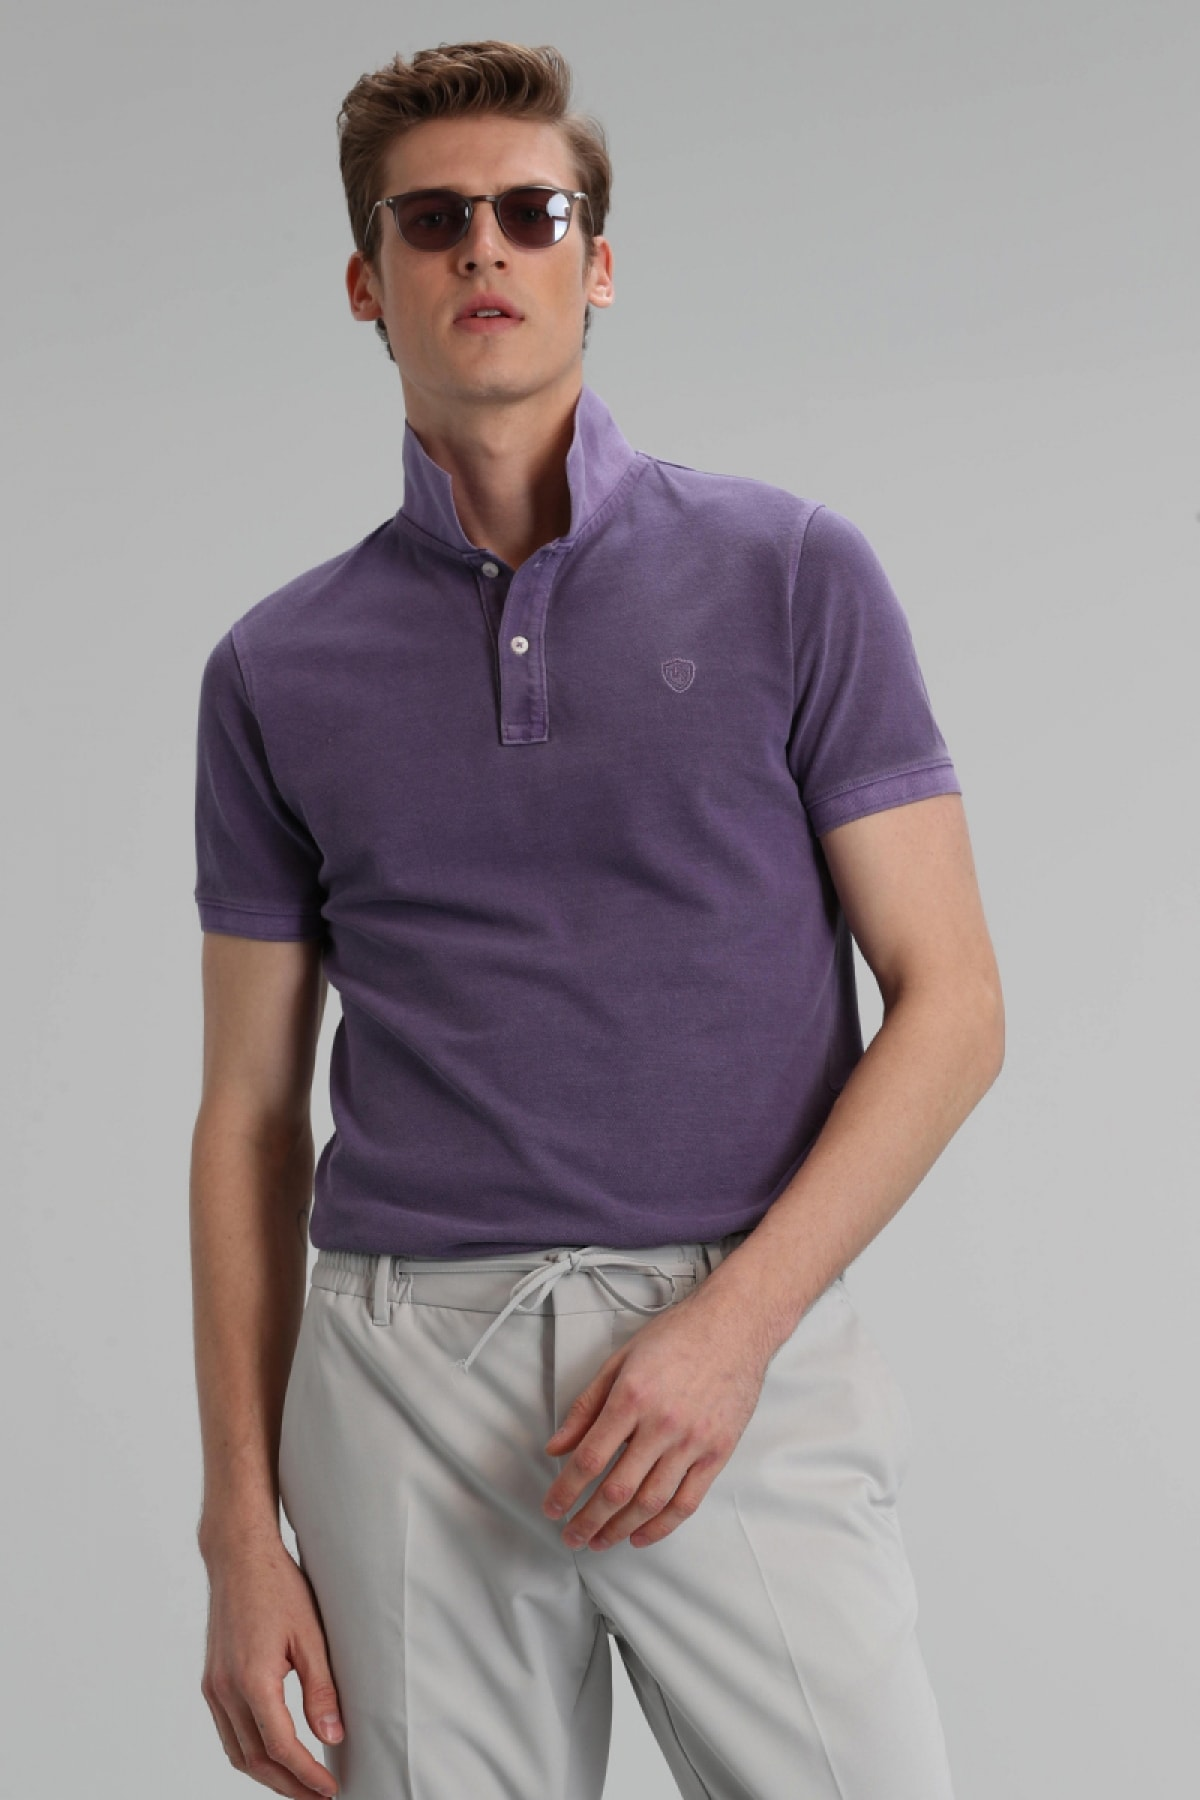 Lufian Erkek Spor Polo T- Shirt 0